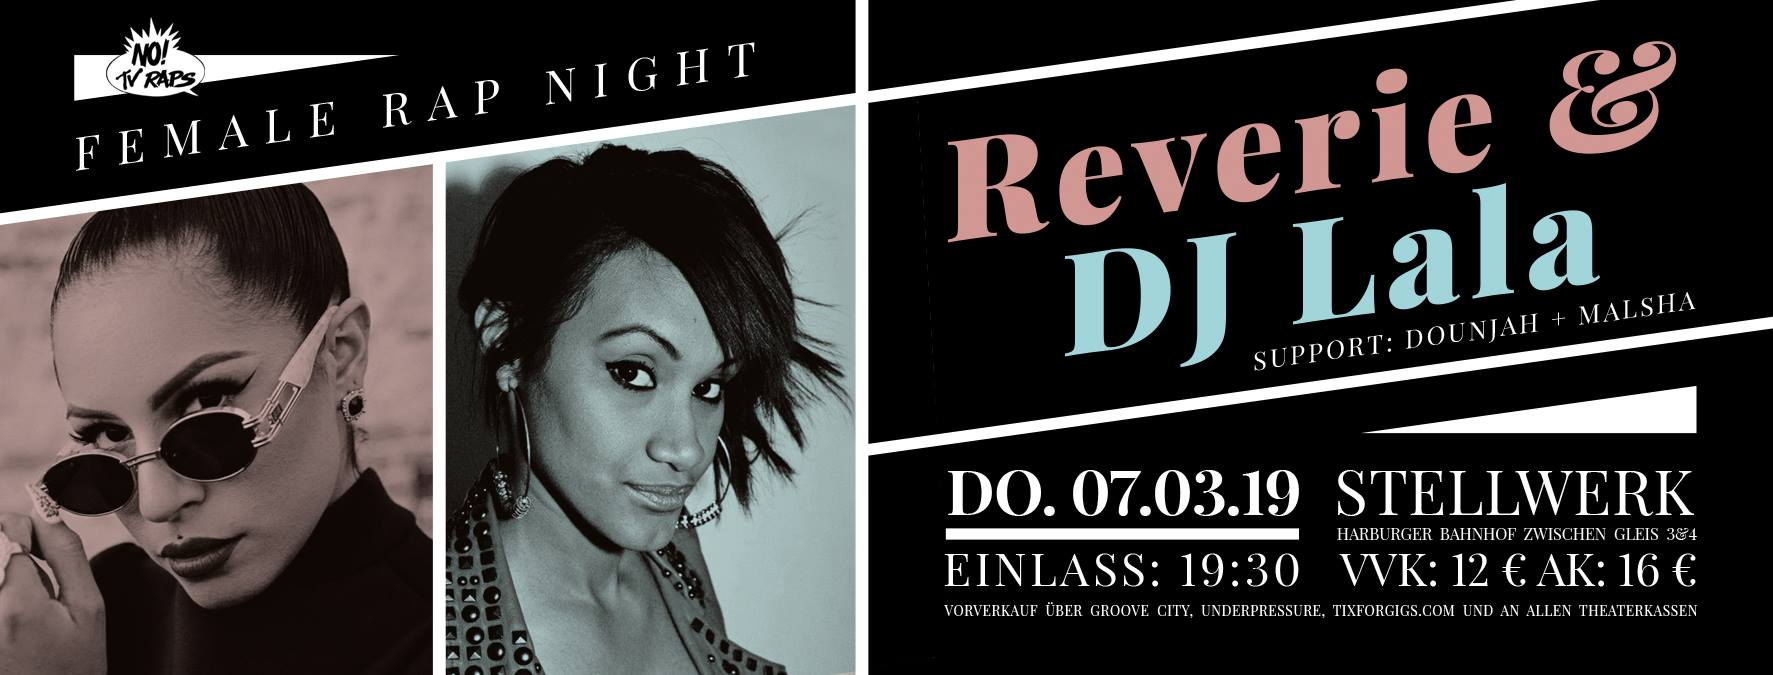 Preview: Female Rap Night feat. Reverie & DJ